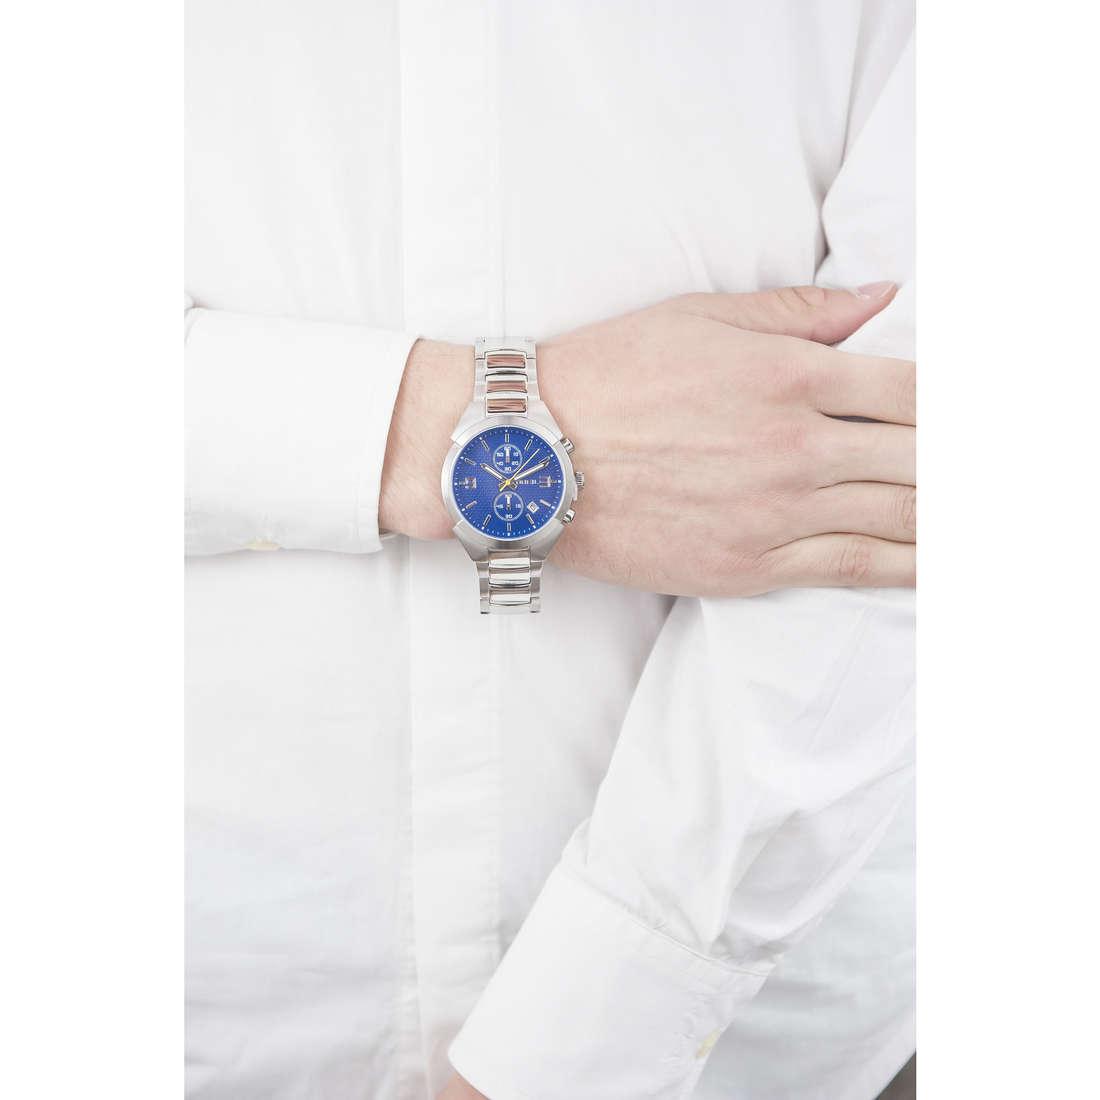 Breil cronografi Gap uomo TW1473 indosso